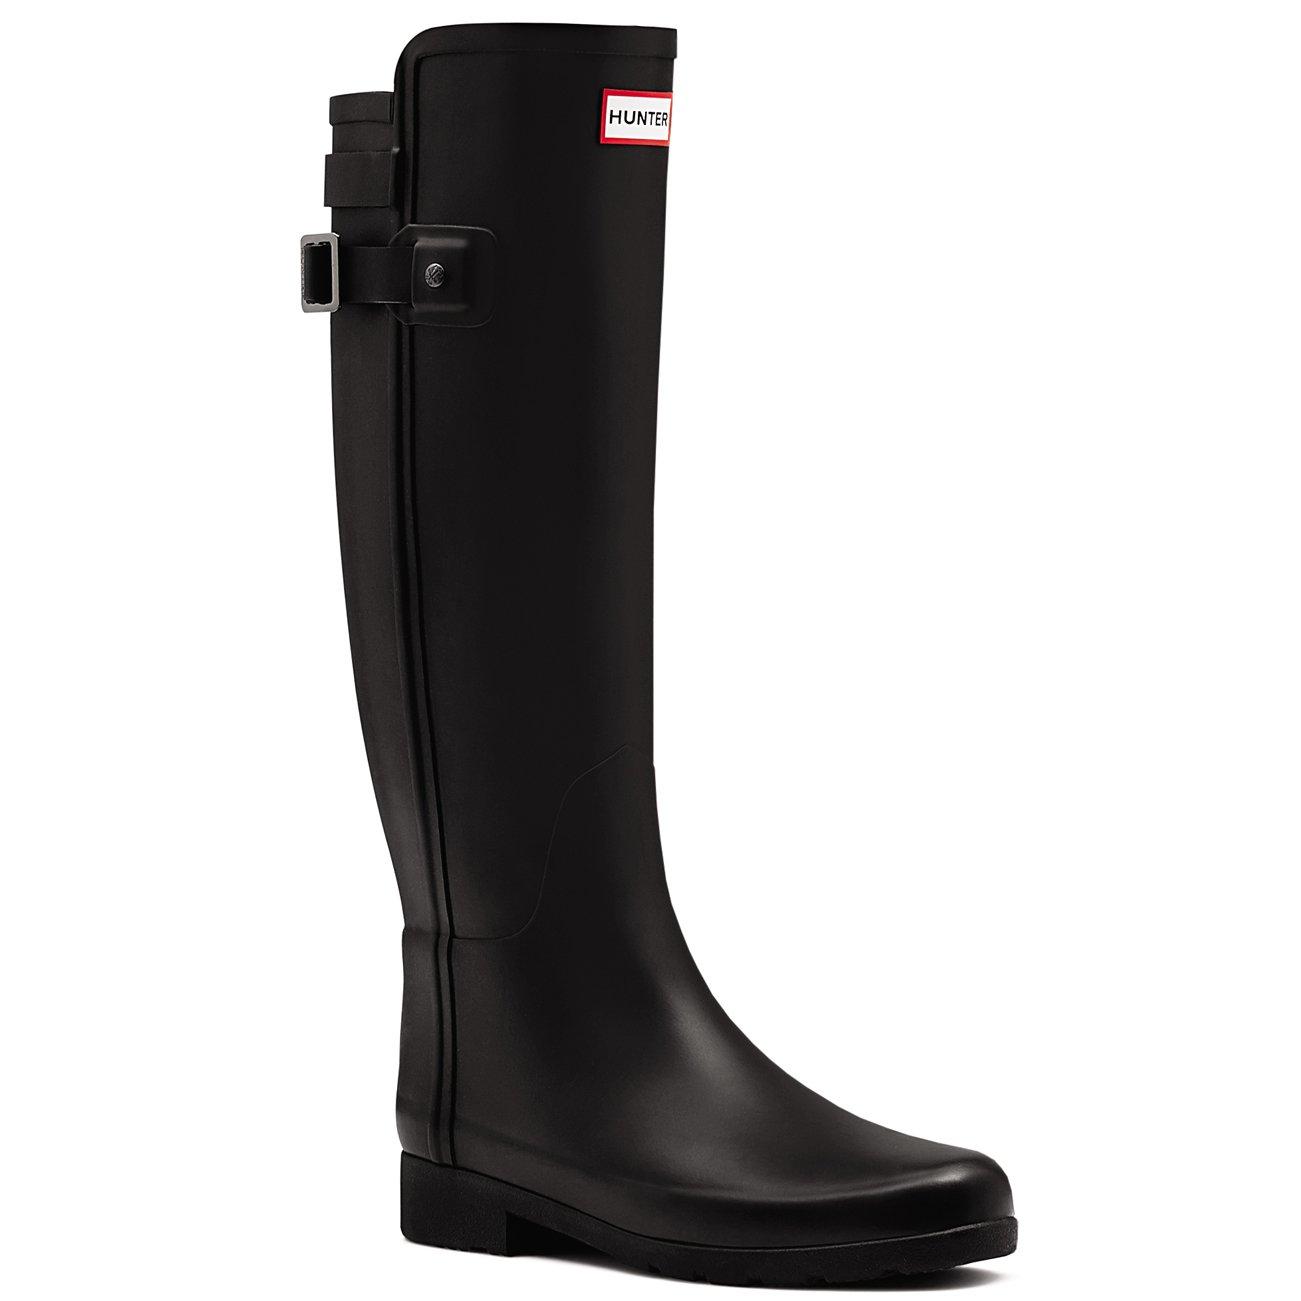 Hunter Boot Women's Original Refined Back Strap Rain Boot Black 7 M US